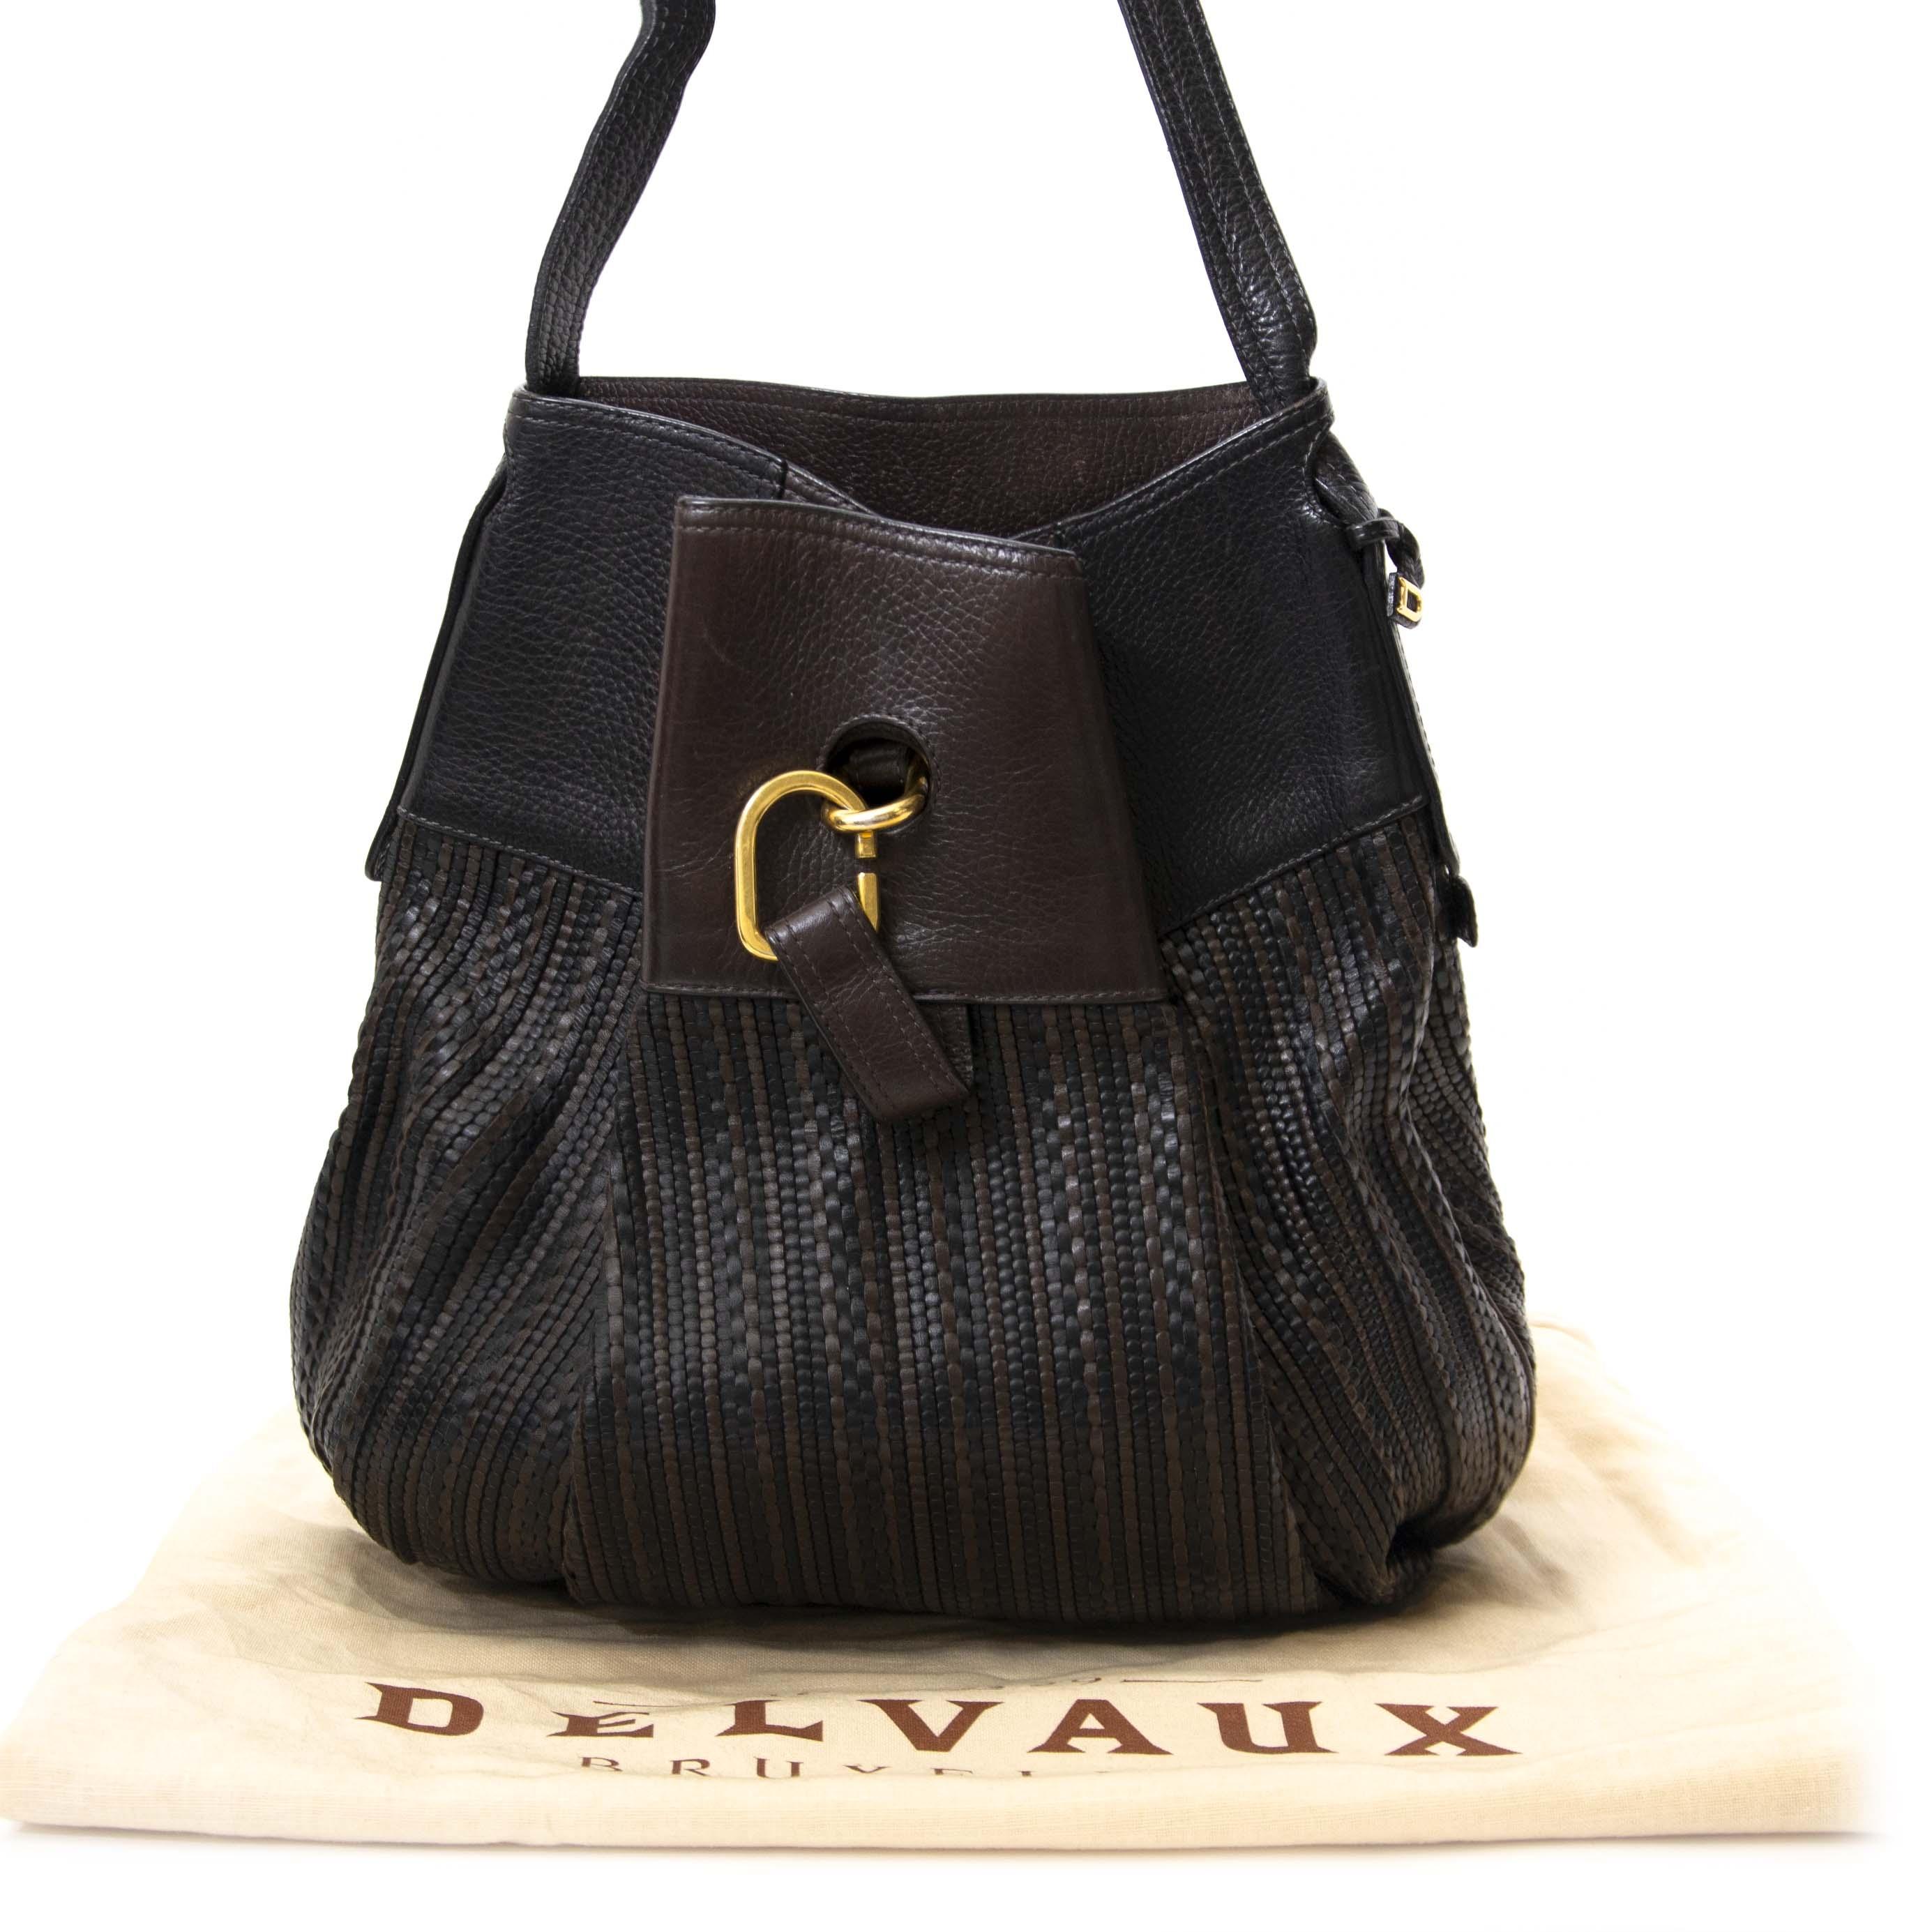 99dcae9d32a2e Safe online shopping Delvaux Brown Toile De Cuir Bag Buy secondhand Delvaux  handbags at Labellov. Safe online shopping